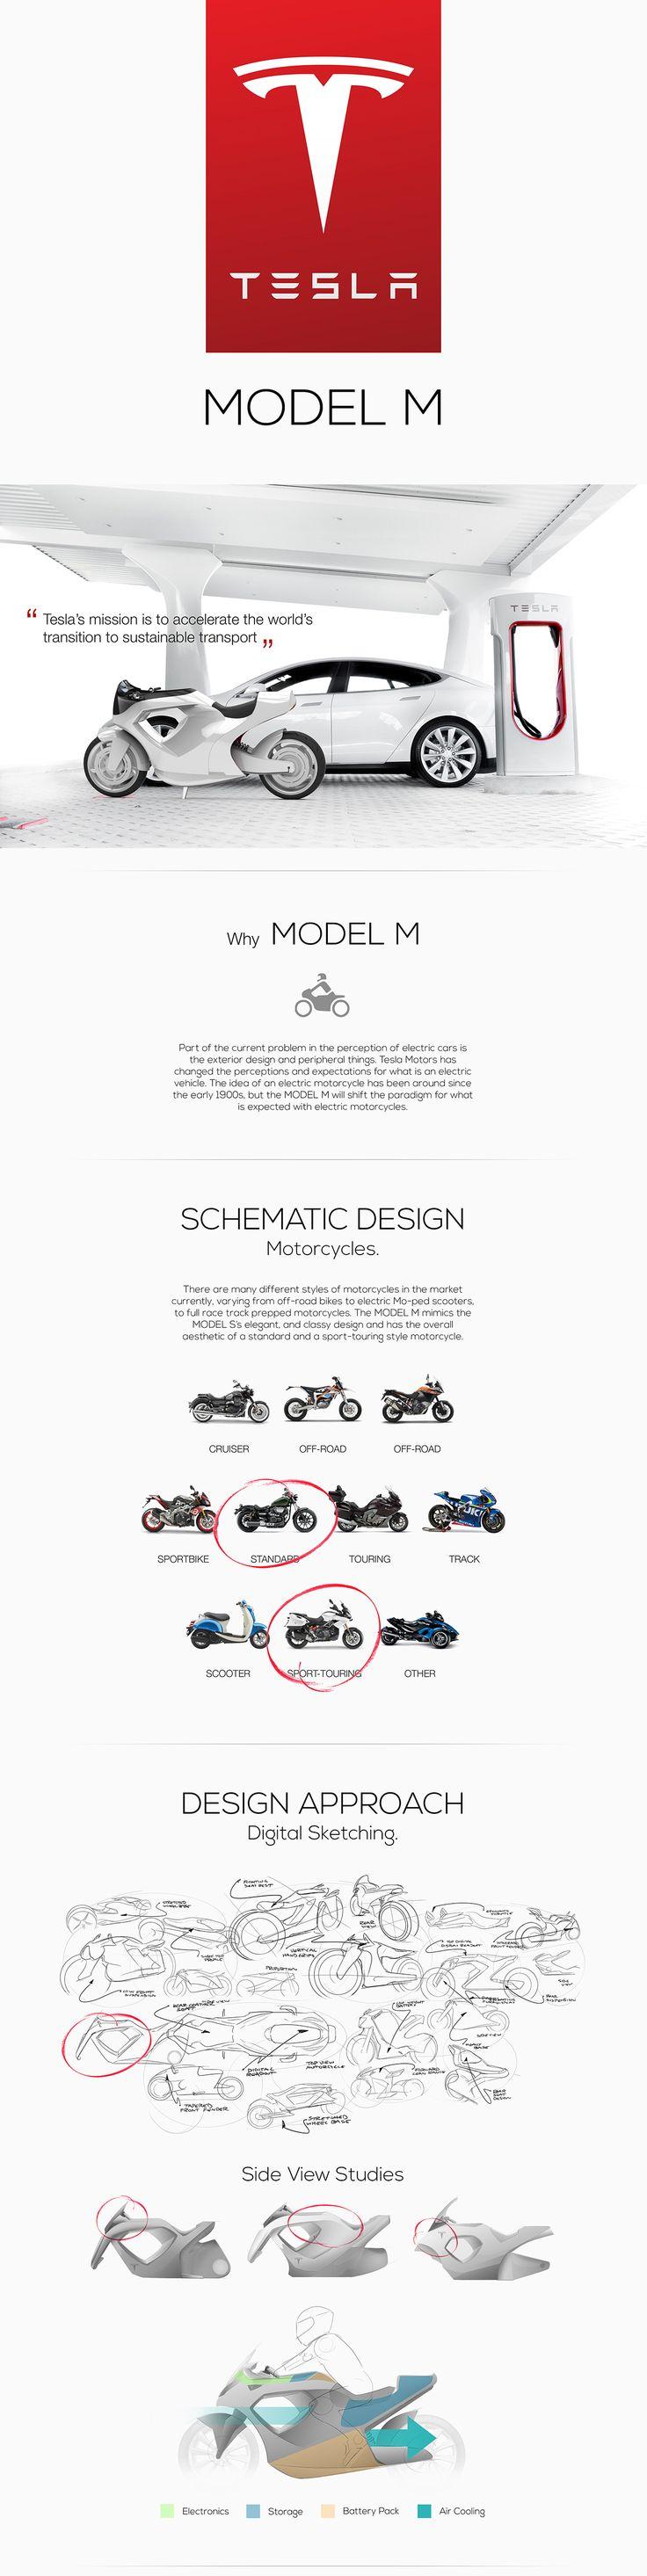 Tesla Model M - Concept Design Motorcycle